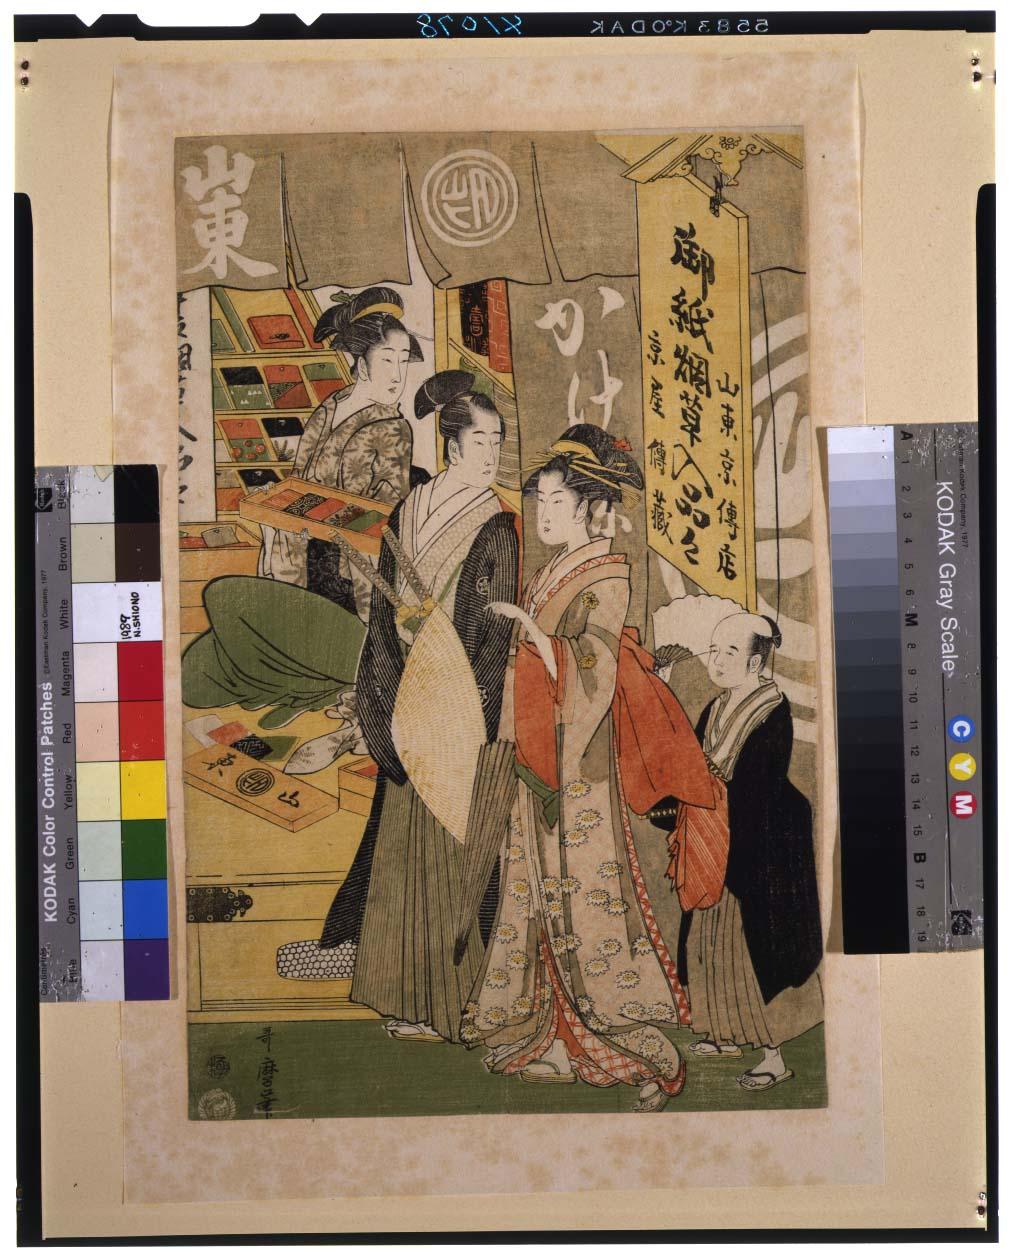 山東京伝の画像 p1_36